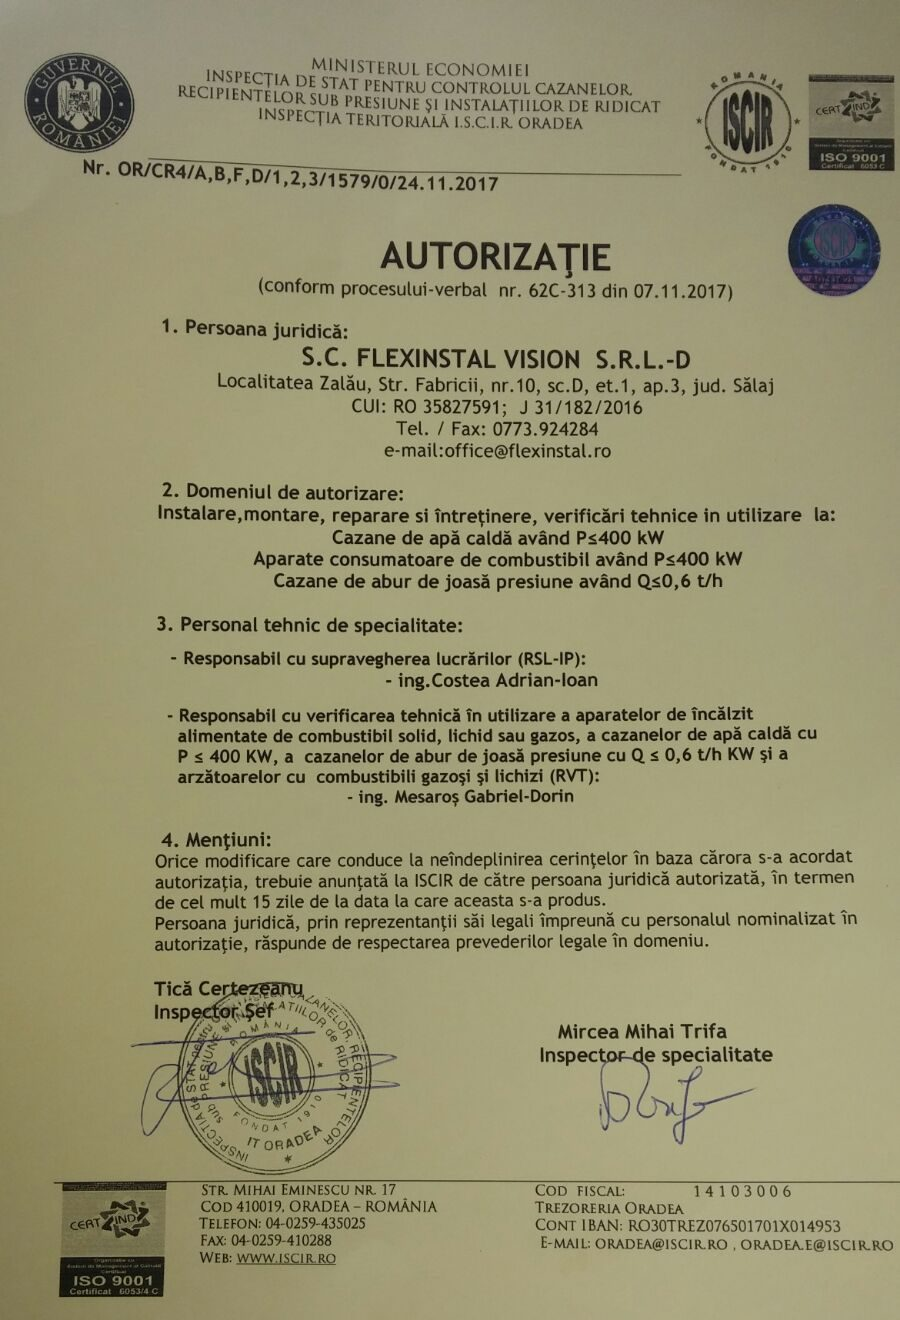 Firma cu Autorizatie ISCIR Zalau FlexInstal